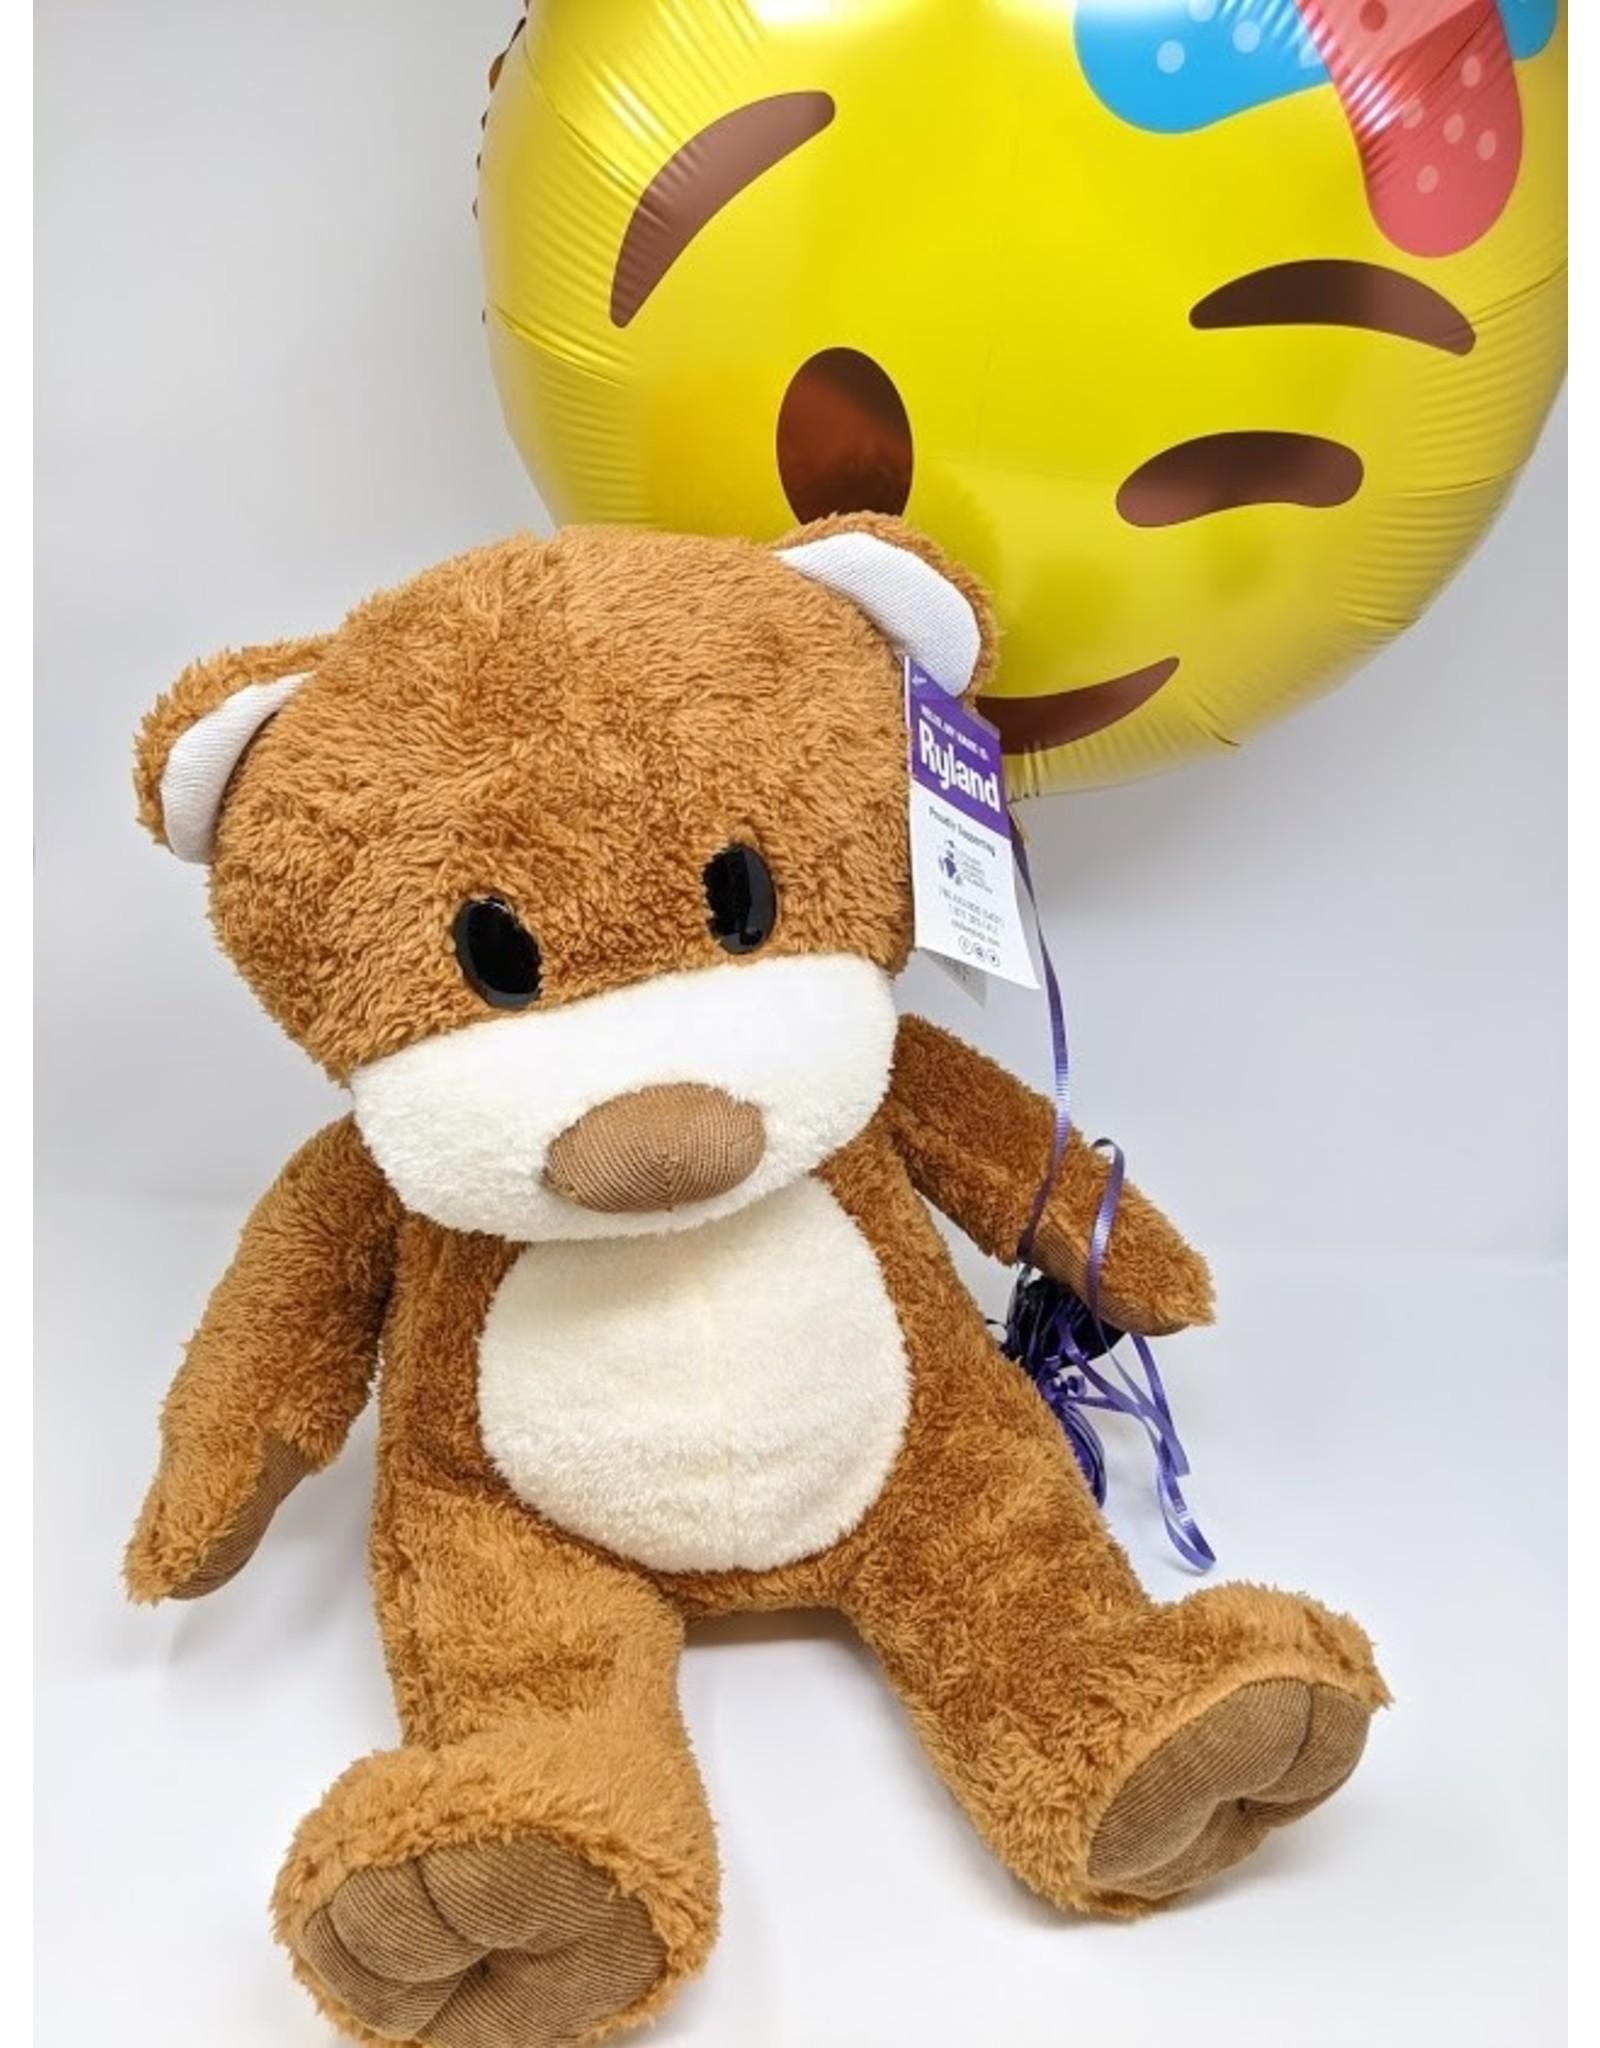 Ryland Bear & Balloon - large